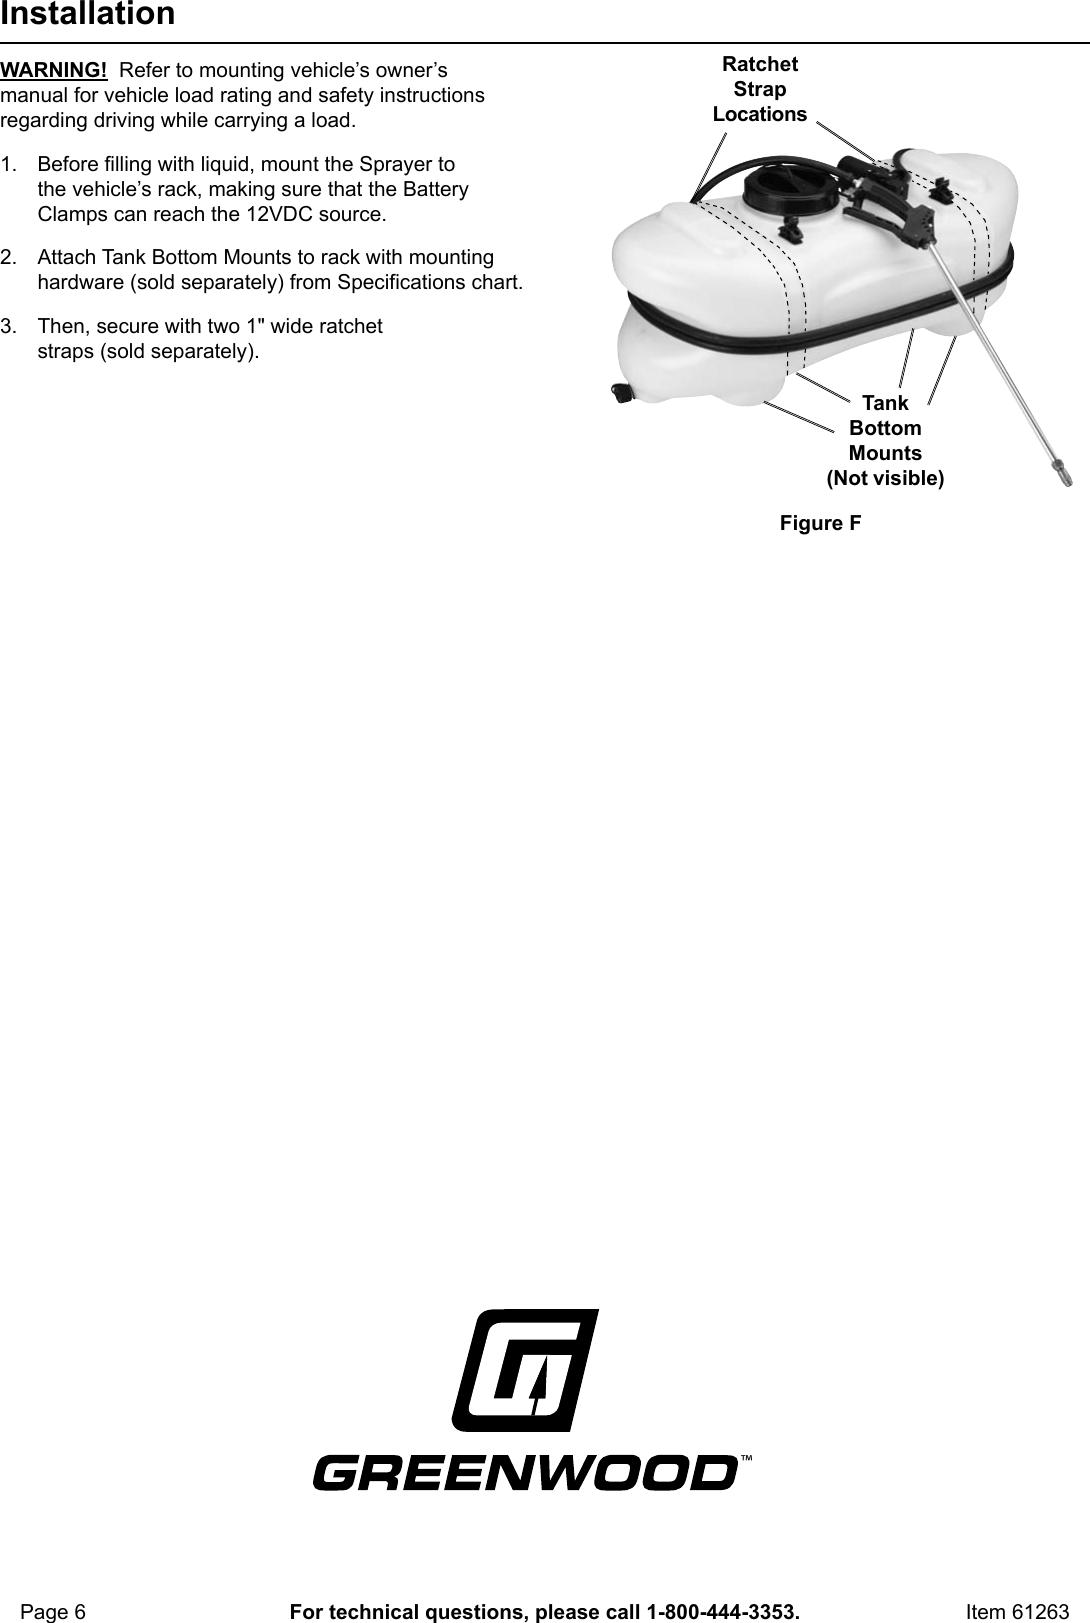 Harbor Freight 15 Gallon Spot Sprayer 12 Volt Product Manual